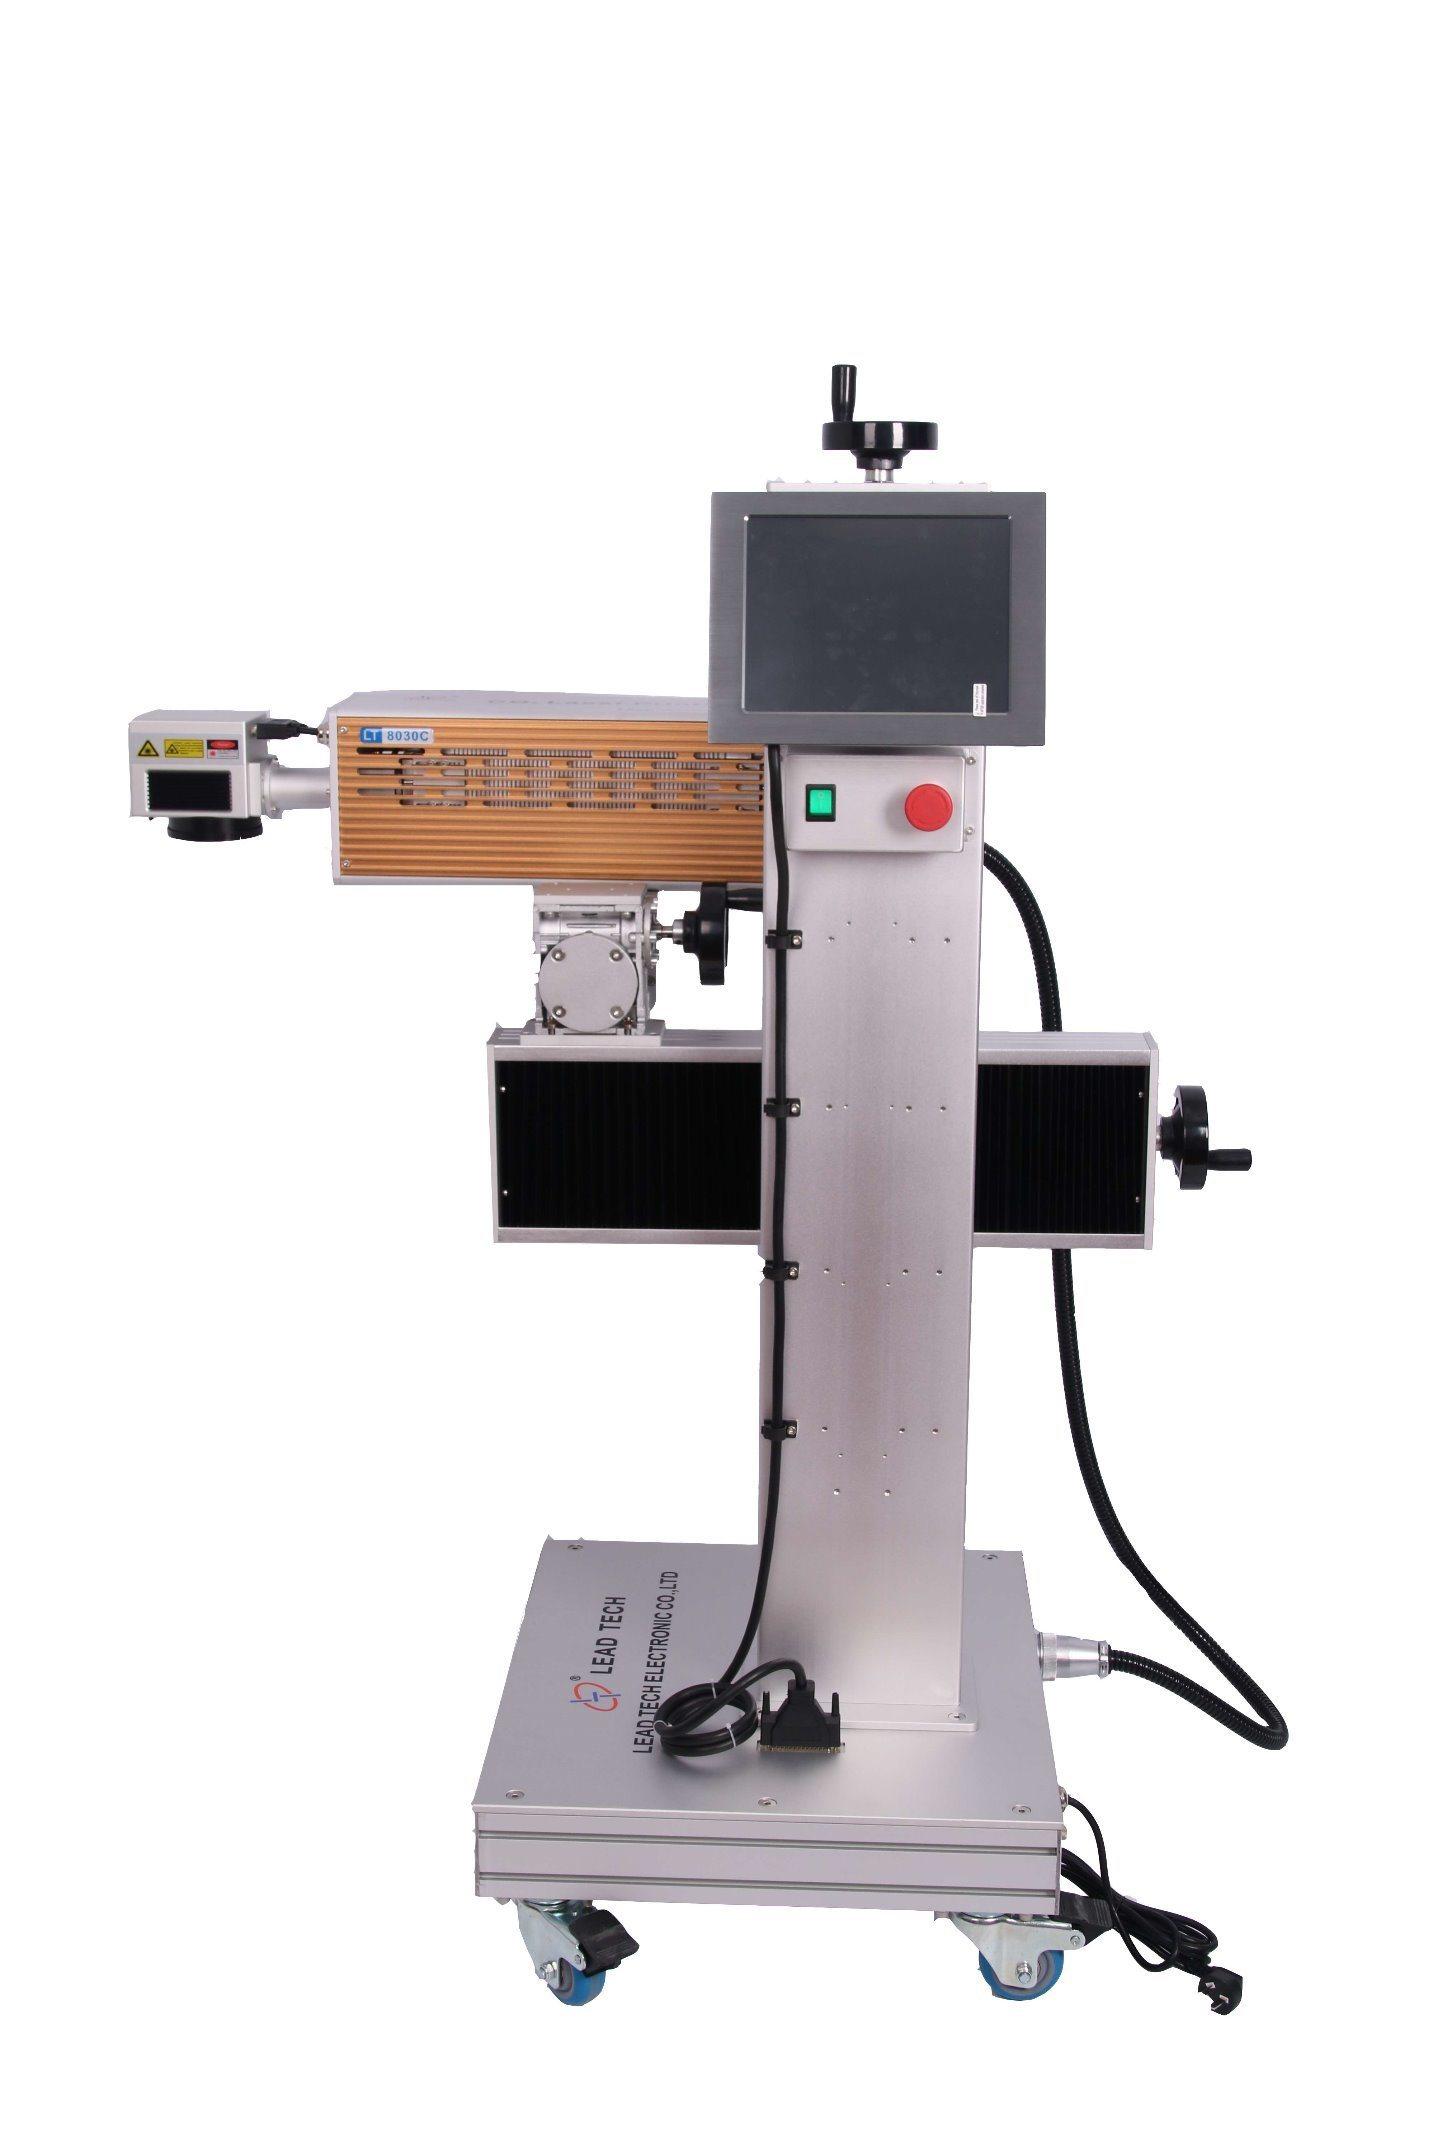 Lead Tech Lt8020c/Lt8030c CO2 20W/30W Style Digital Laser Printer for Plastic Logo Metal Printing